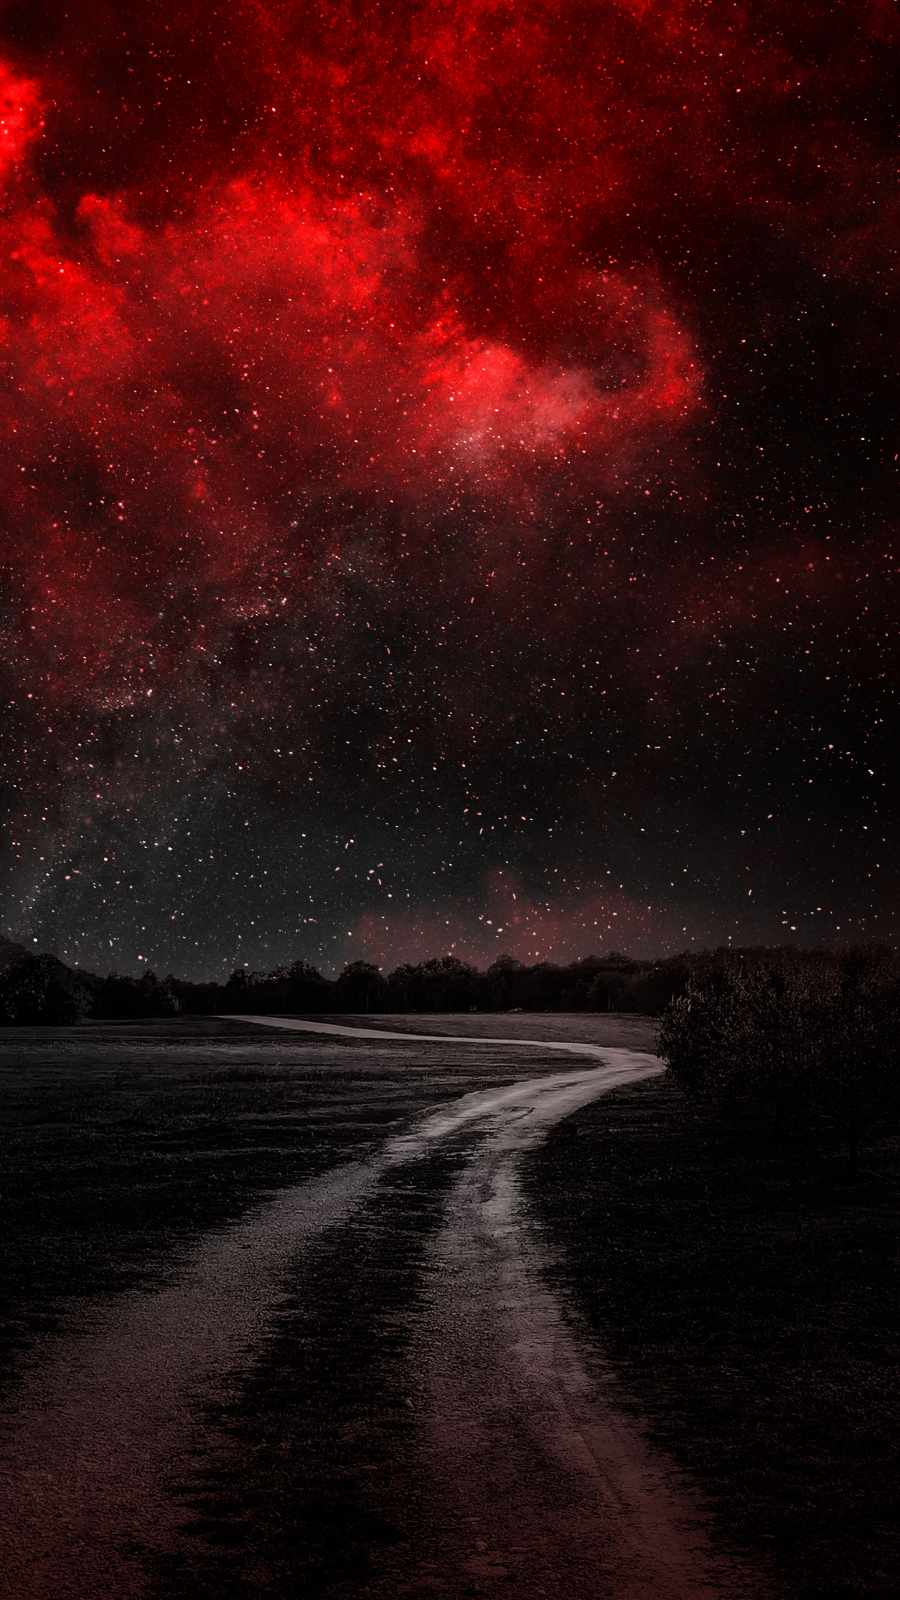 Starry Night Red Nebula